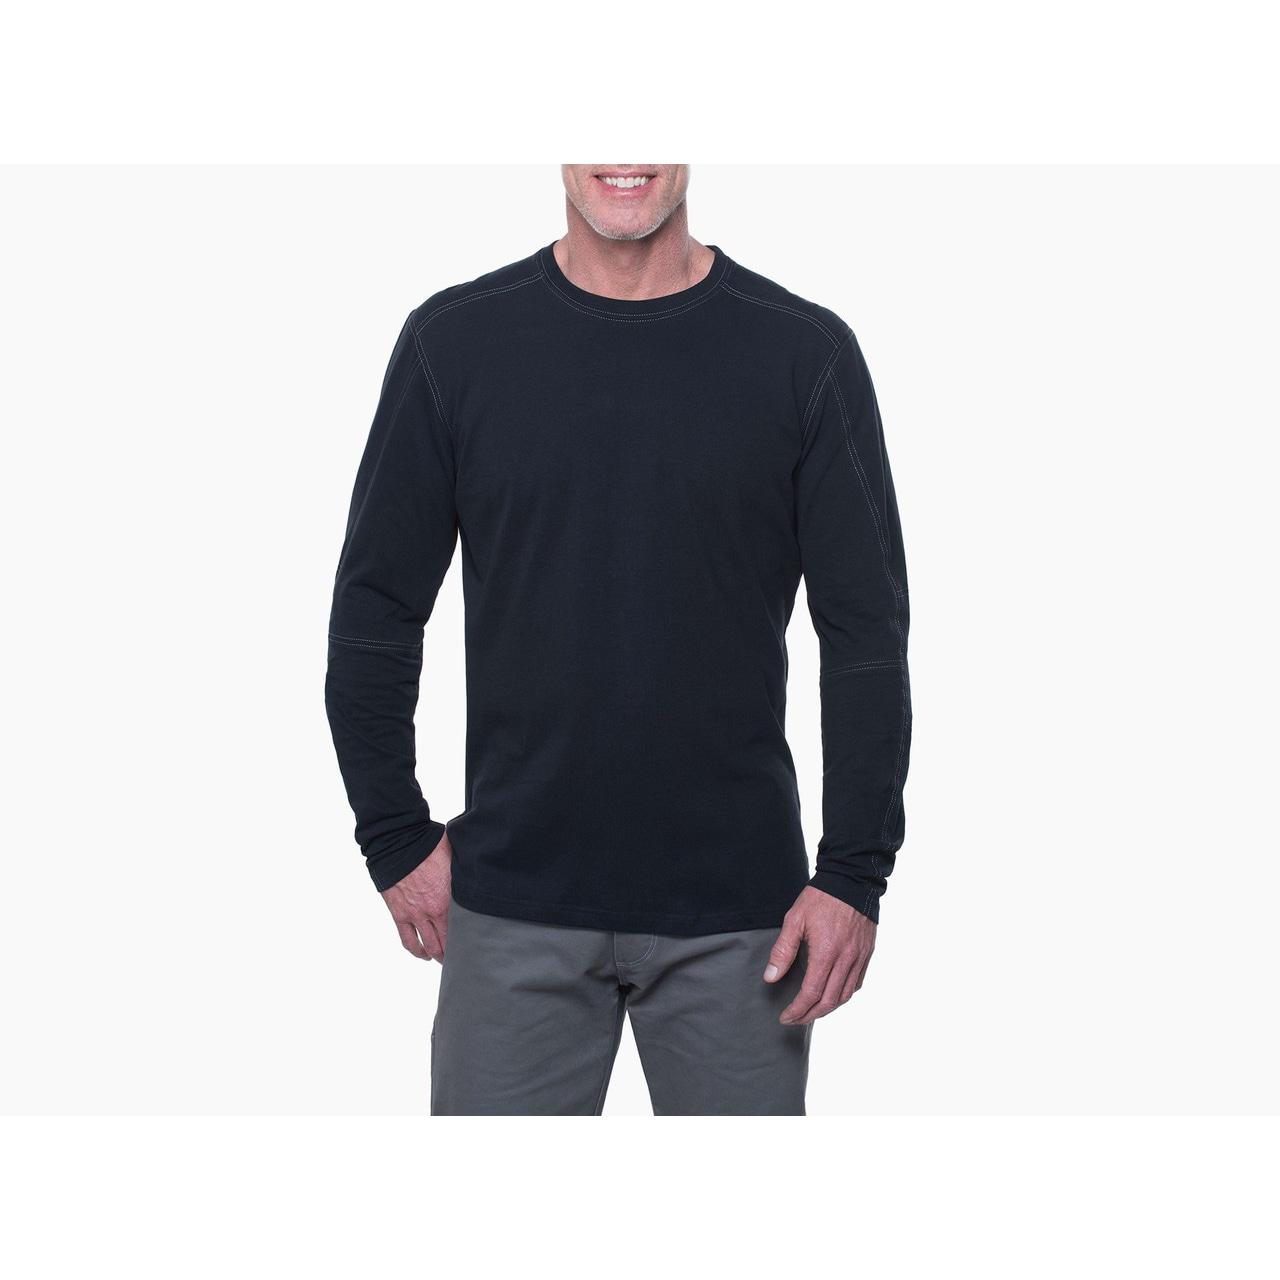 Bravado Long Sleeve - Men's